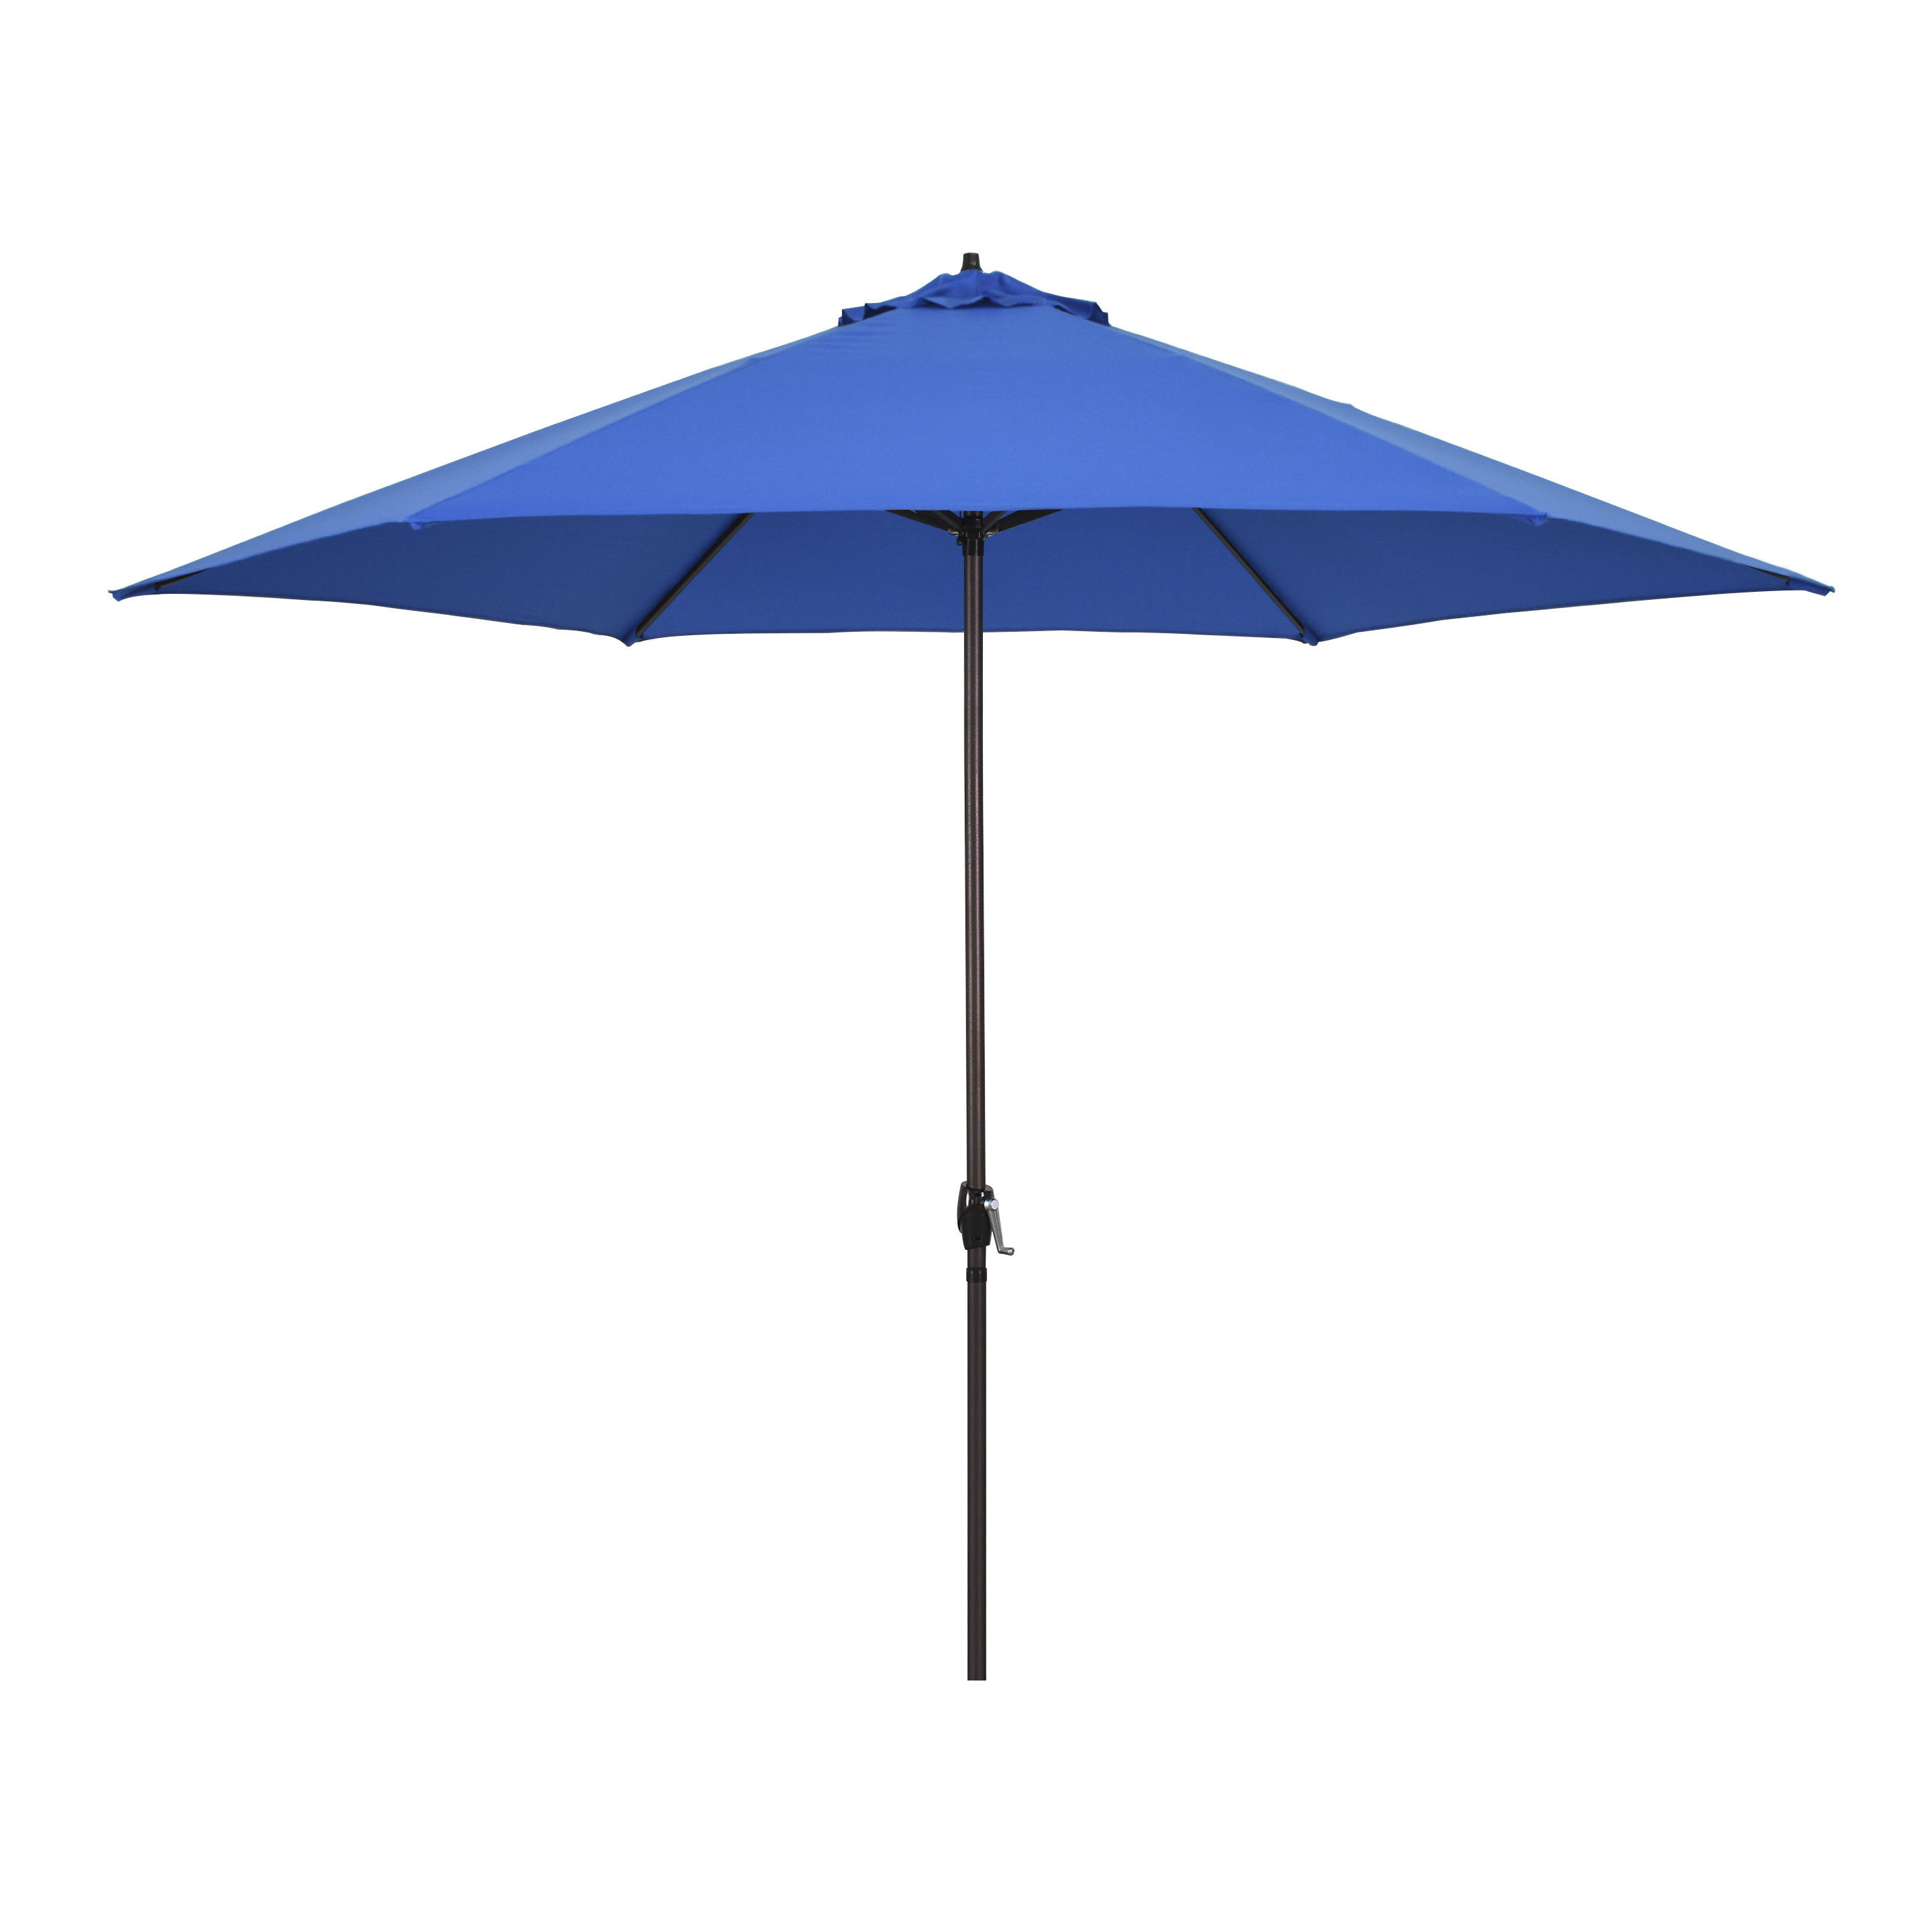 Mraz Market Umbrellas Regarding Well Known Mcdougal 11' Market Umbrella (Gallery 20 of 20)